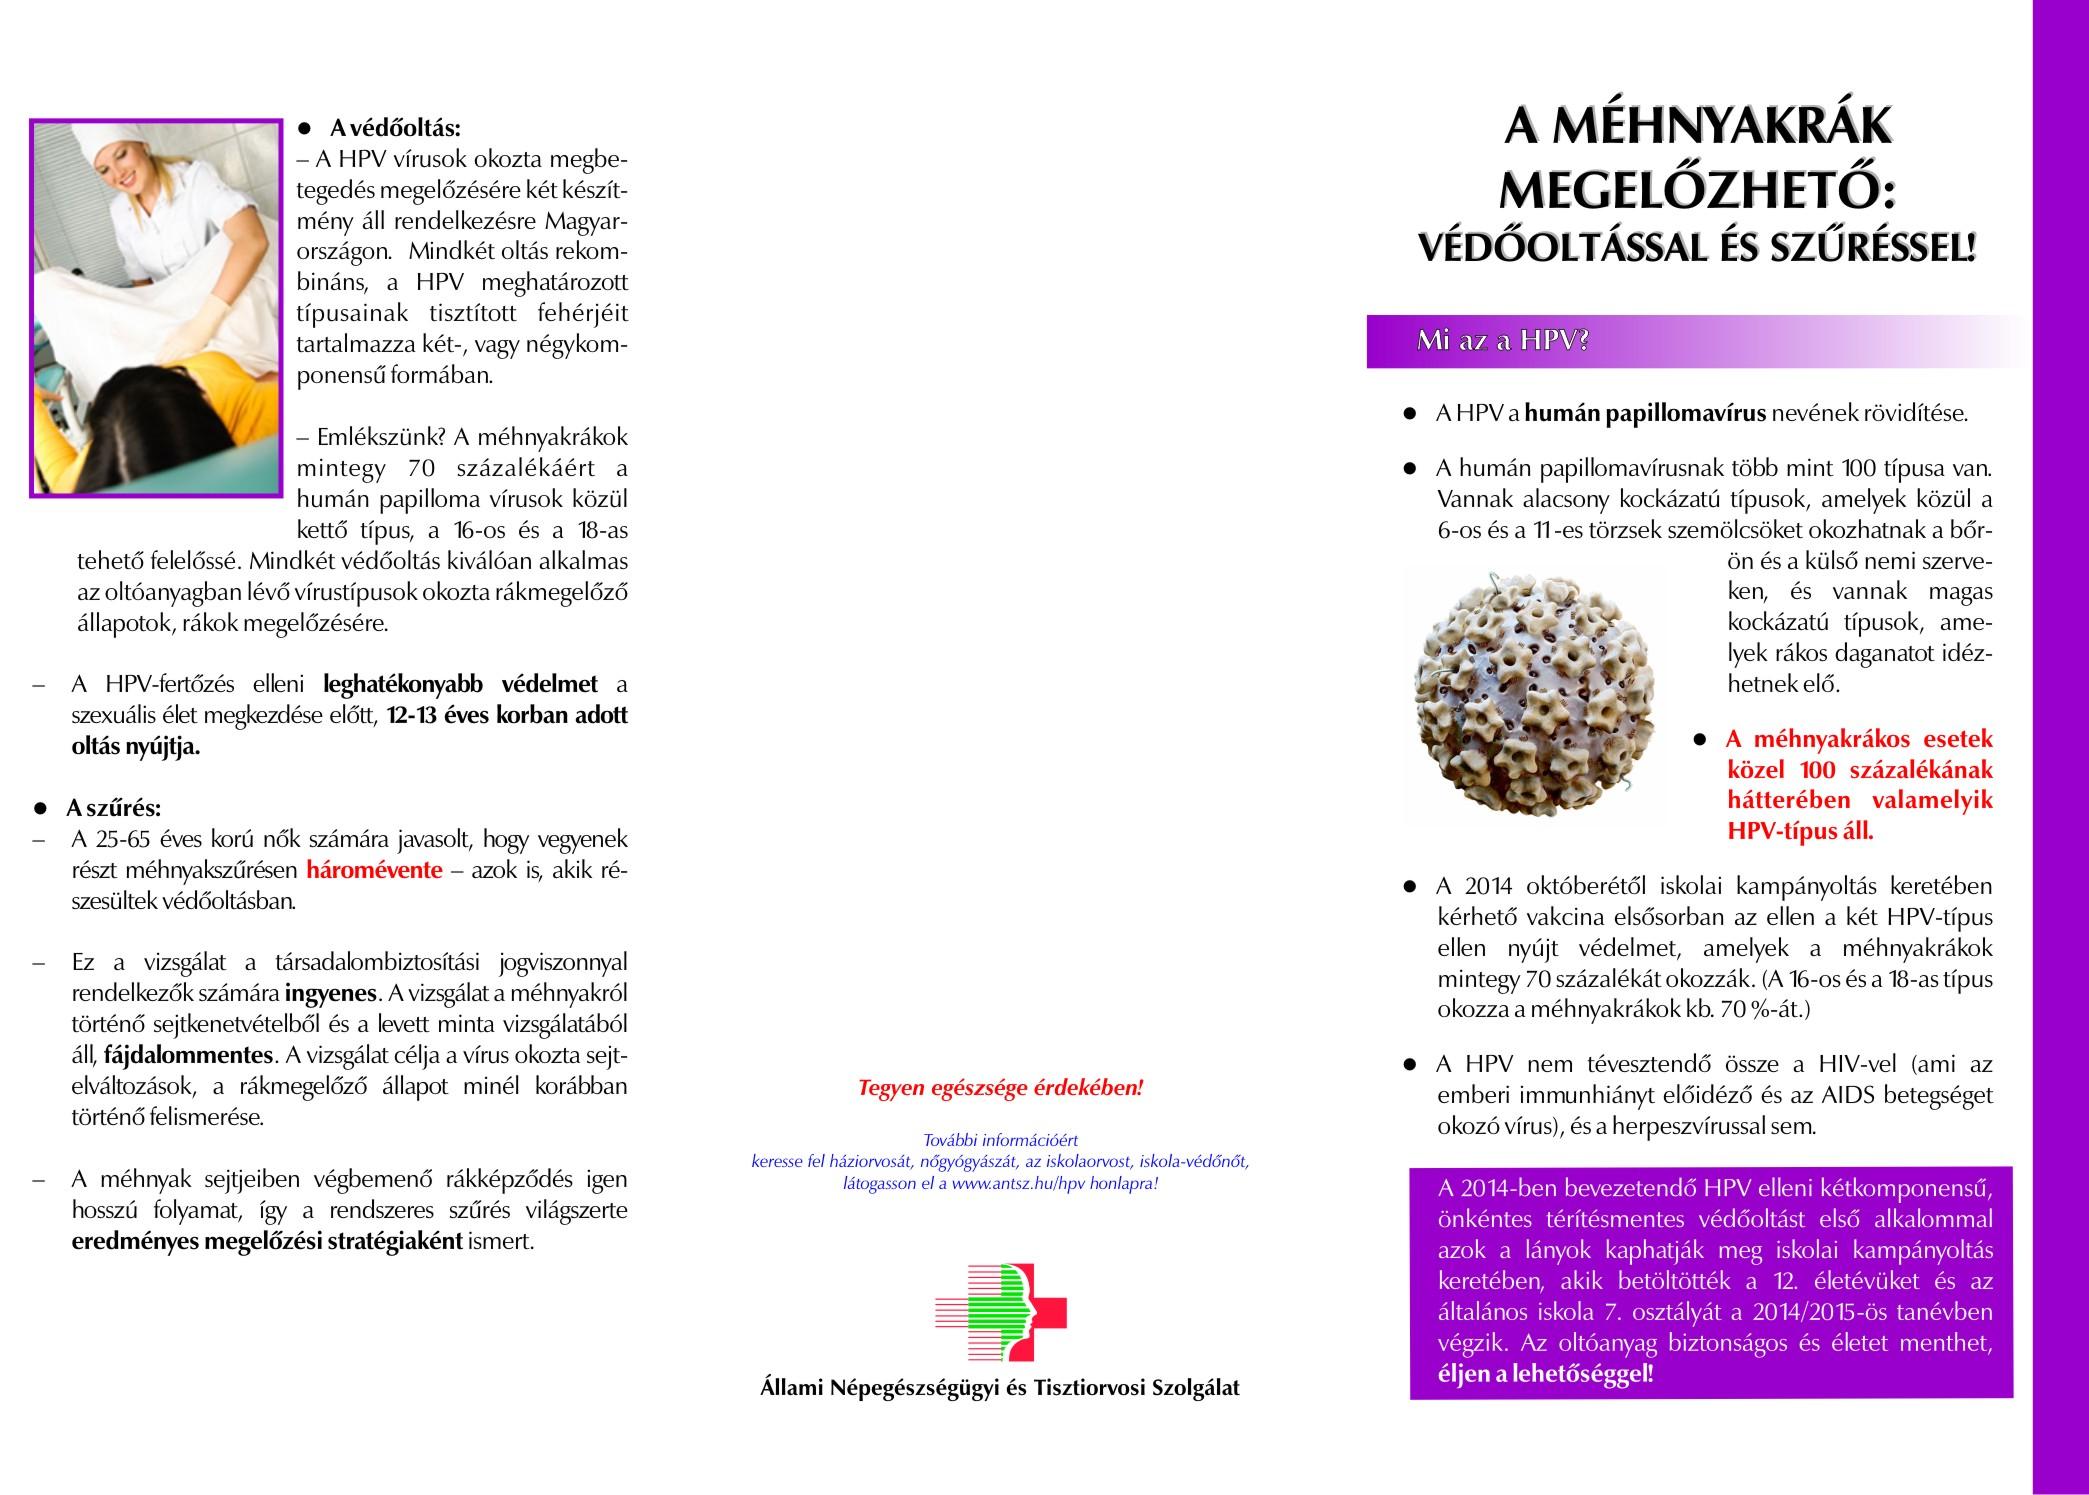 légzési papillomatosis ppt